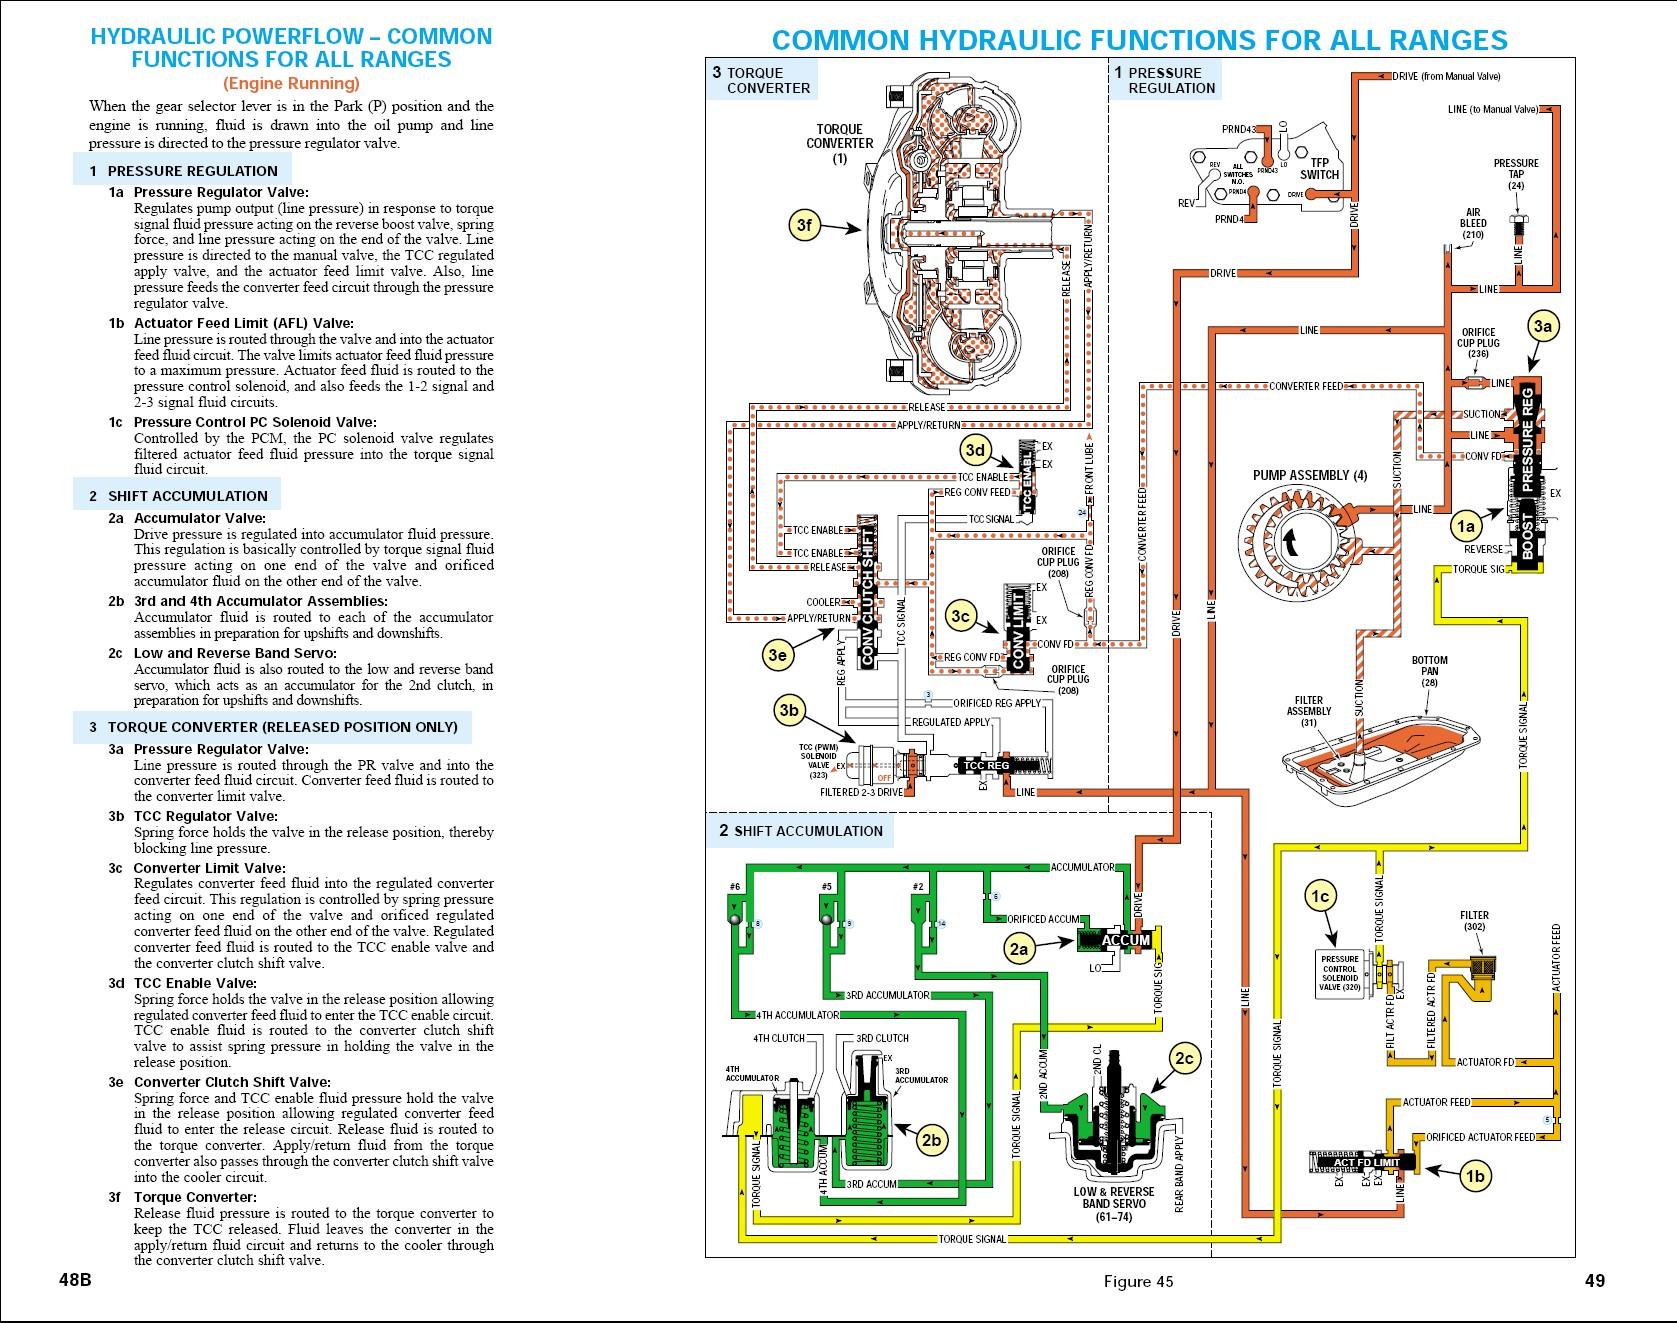 Diagram Of A Transmission 4l60e Transmission Fluid Flow Diagram Bing Wiring Info • Of Diagram Of A Transmission